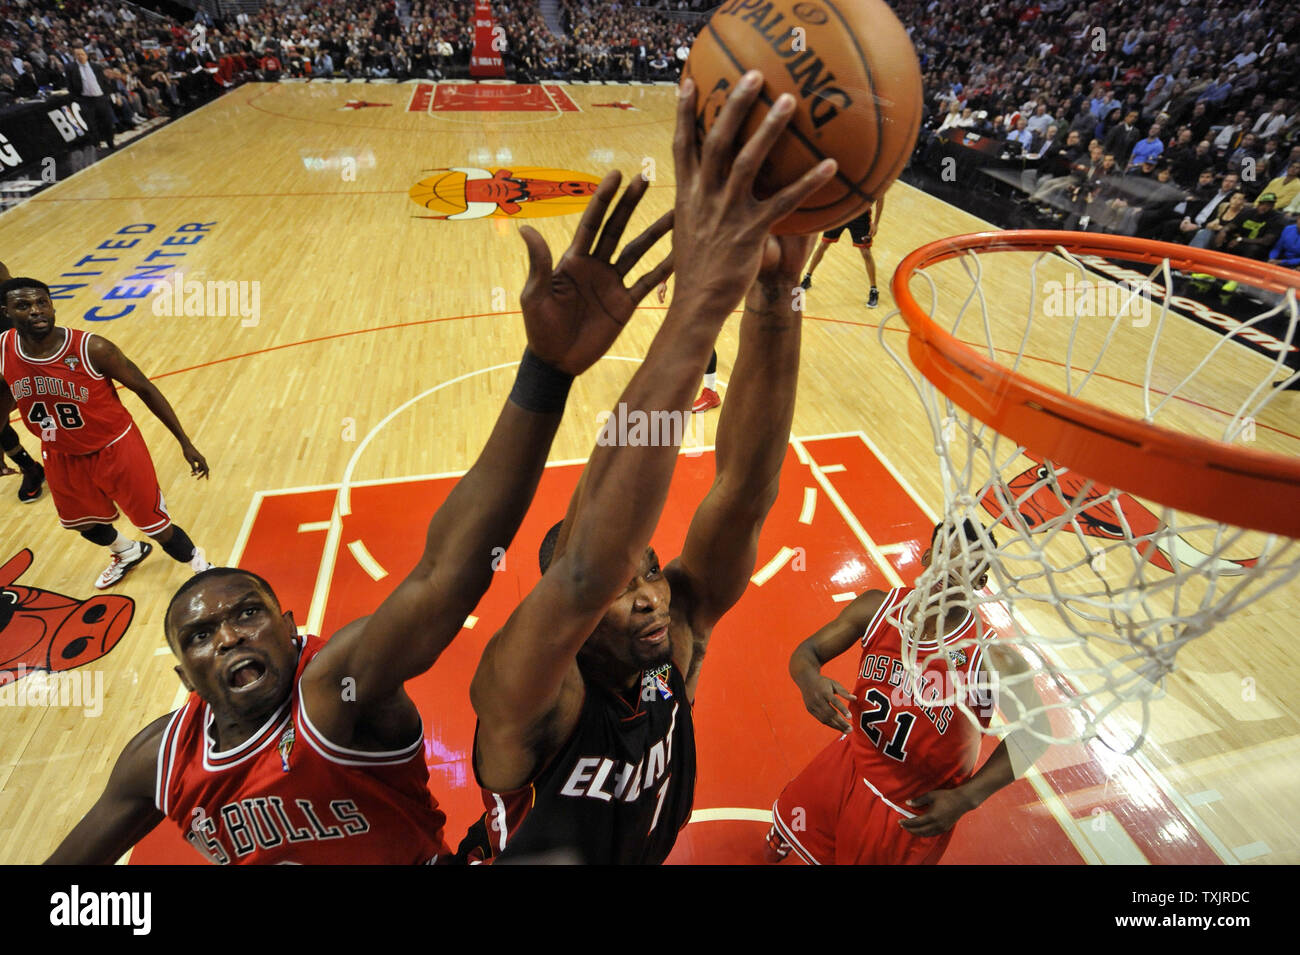 Miami Heat center Chris Bosh (R) dunks as Chicago Bulls